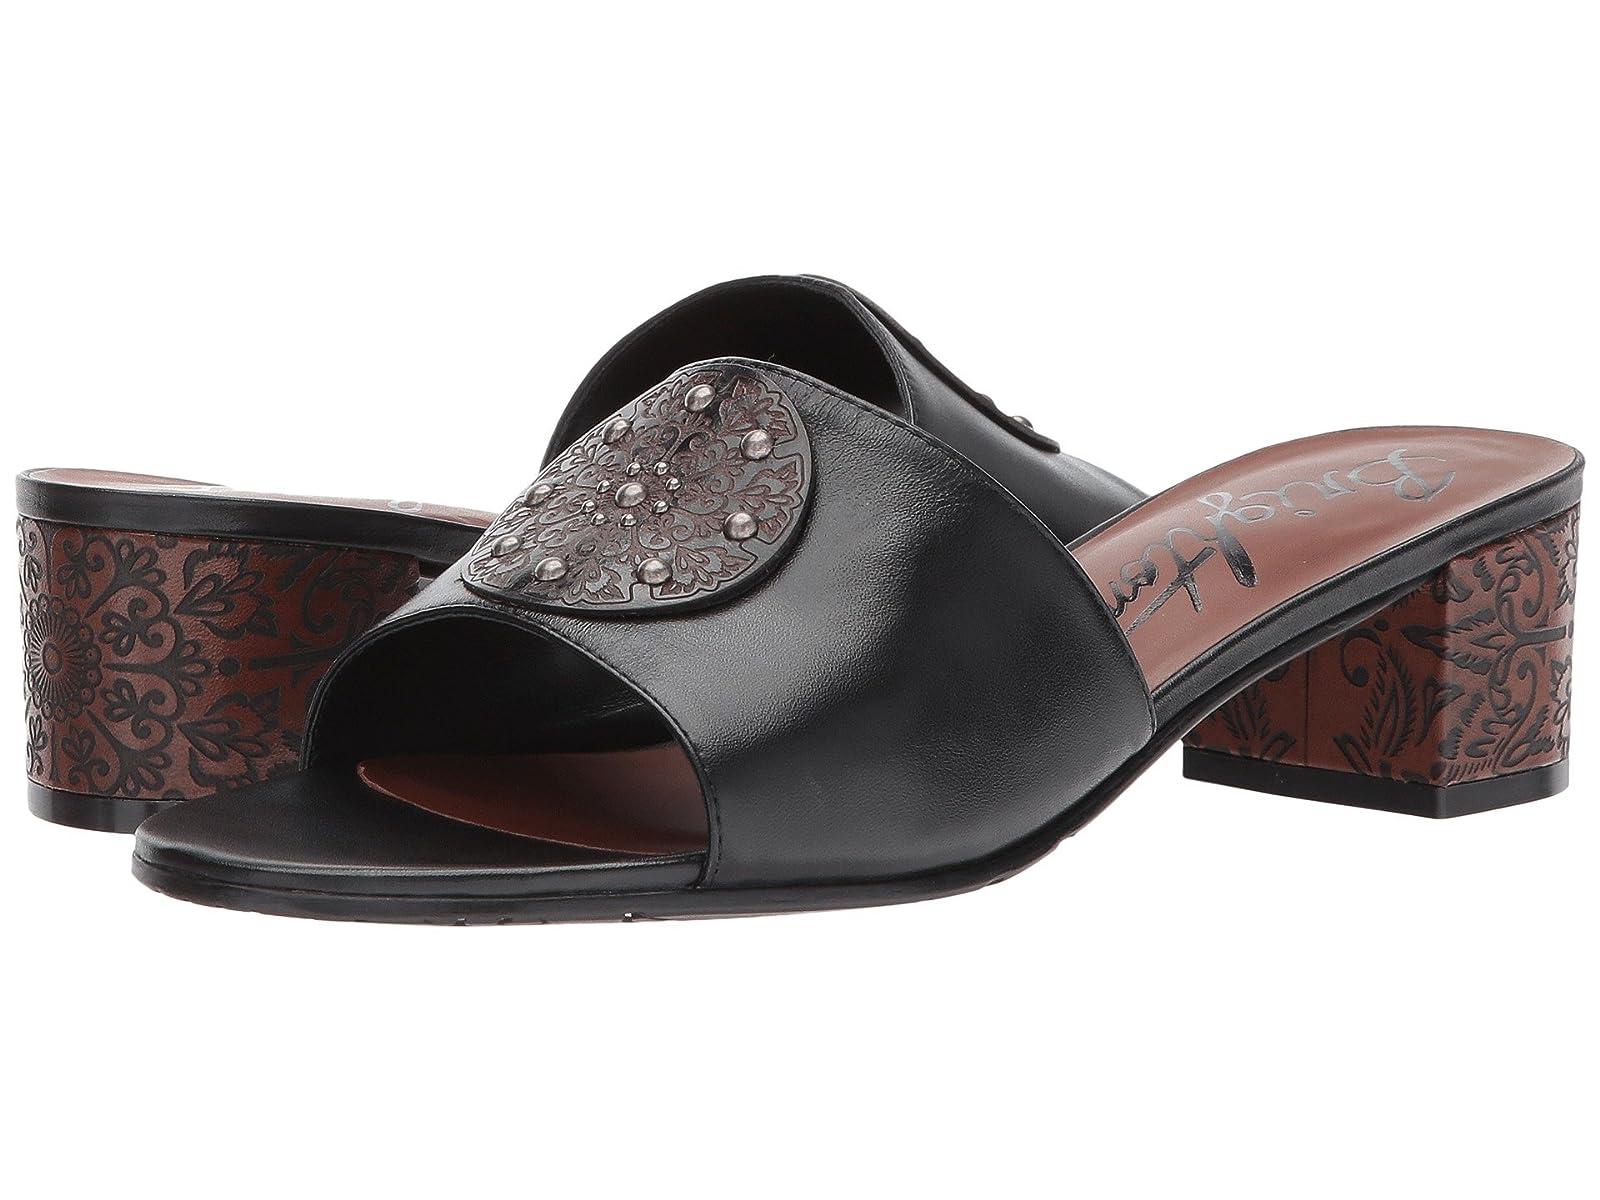 Brighton KarlaAtmospheric grades have affordable shoes